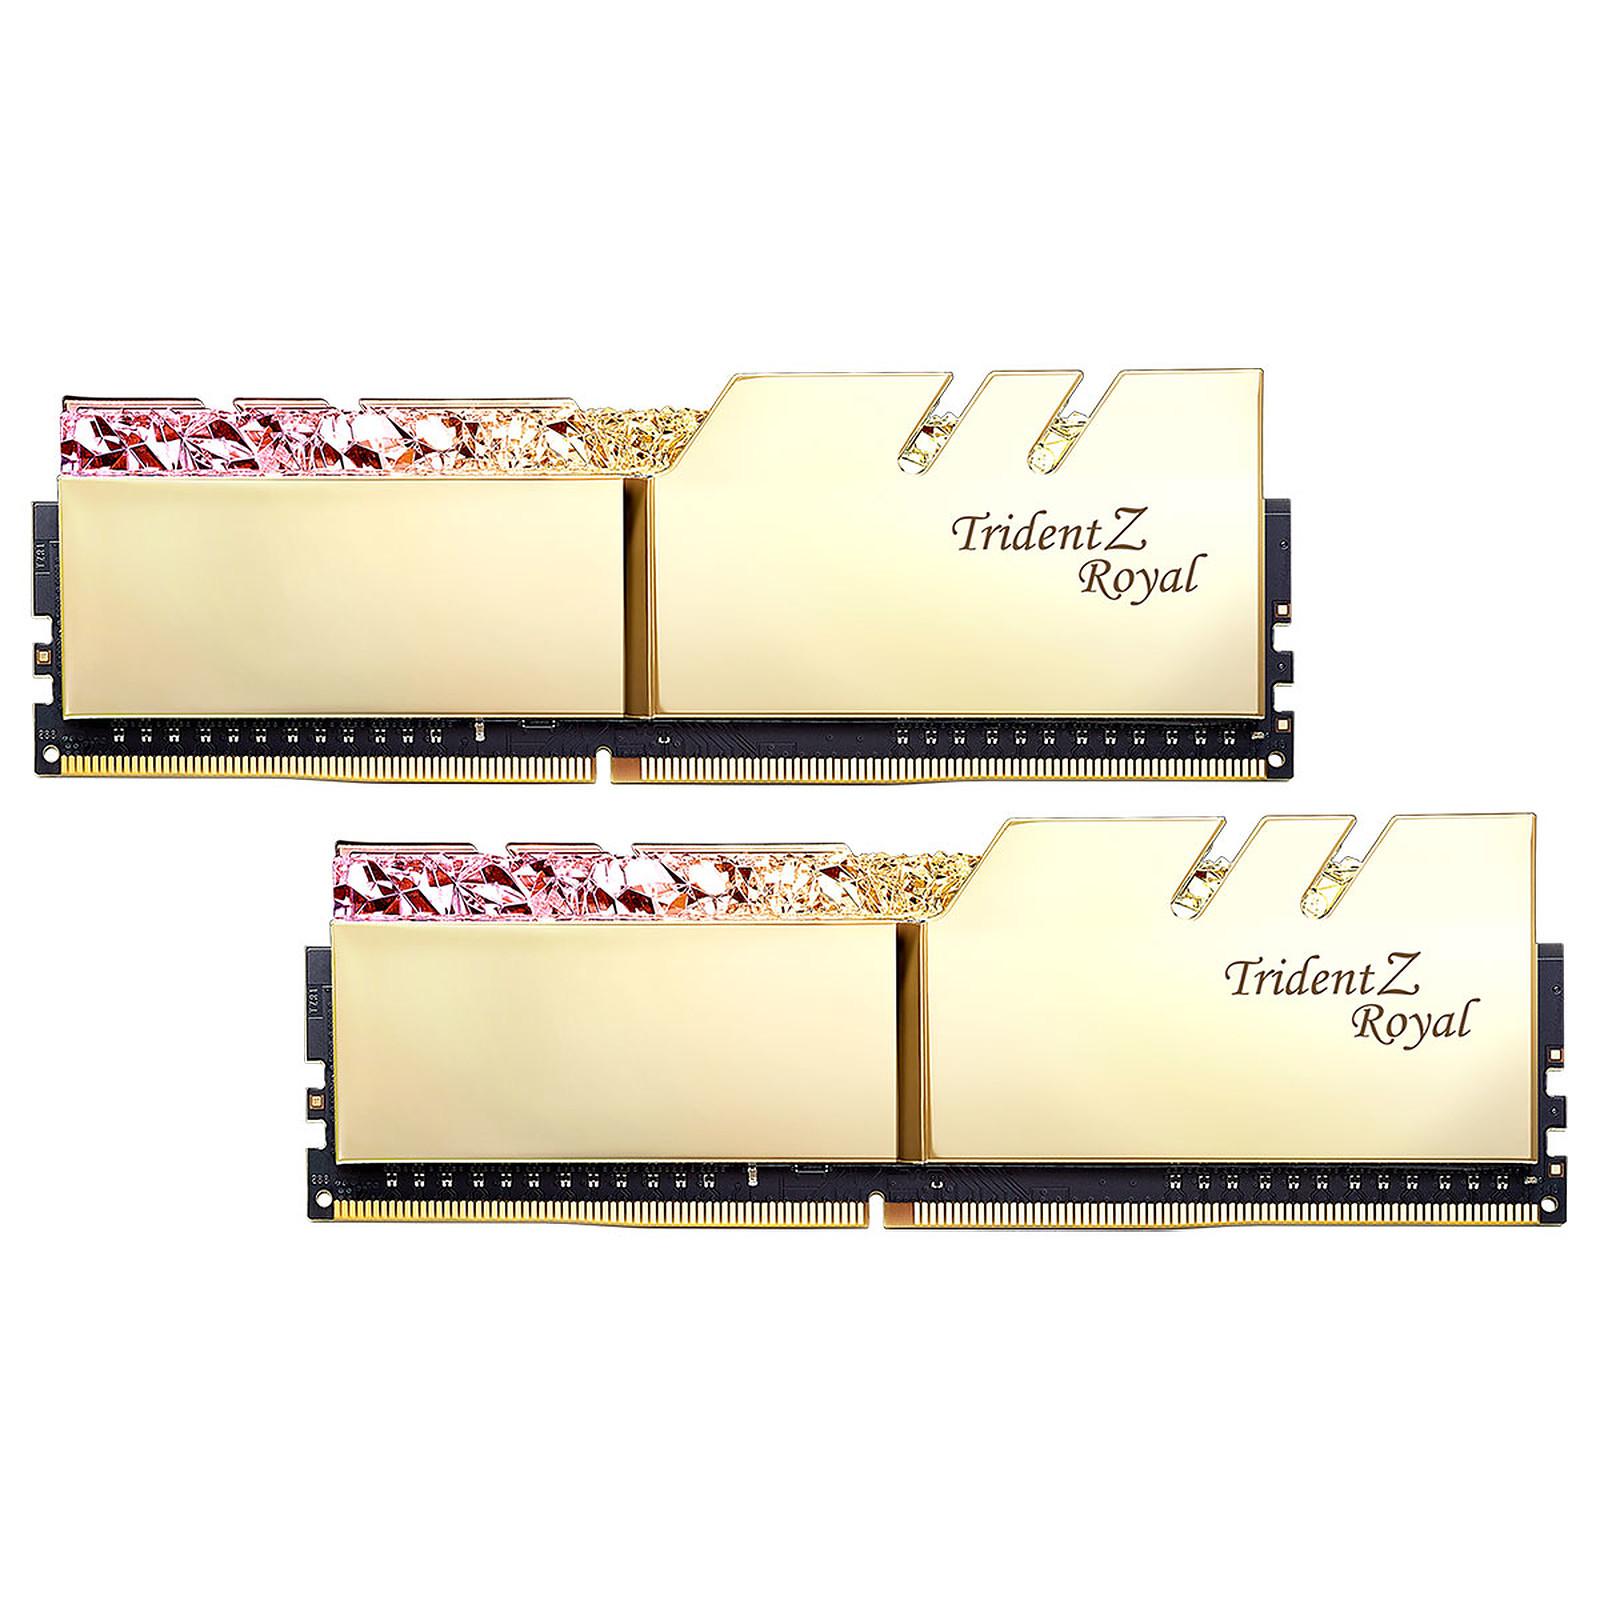 G.Skill Trident Z Royal 32GB (2 x 16GB) DDR4 3200 MHz CL16 - Gold